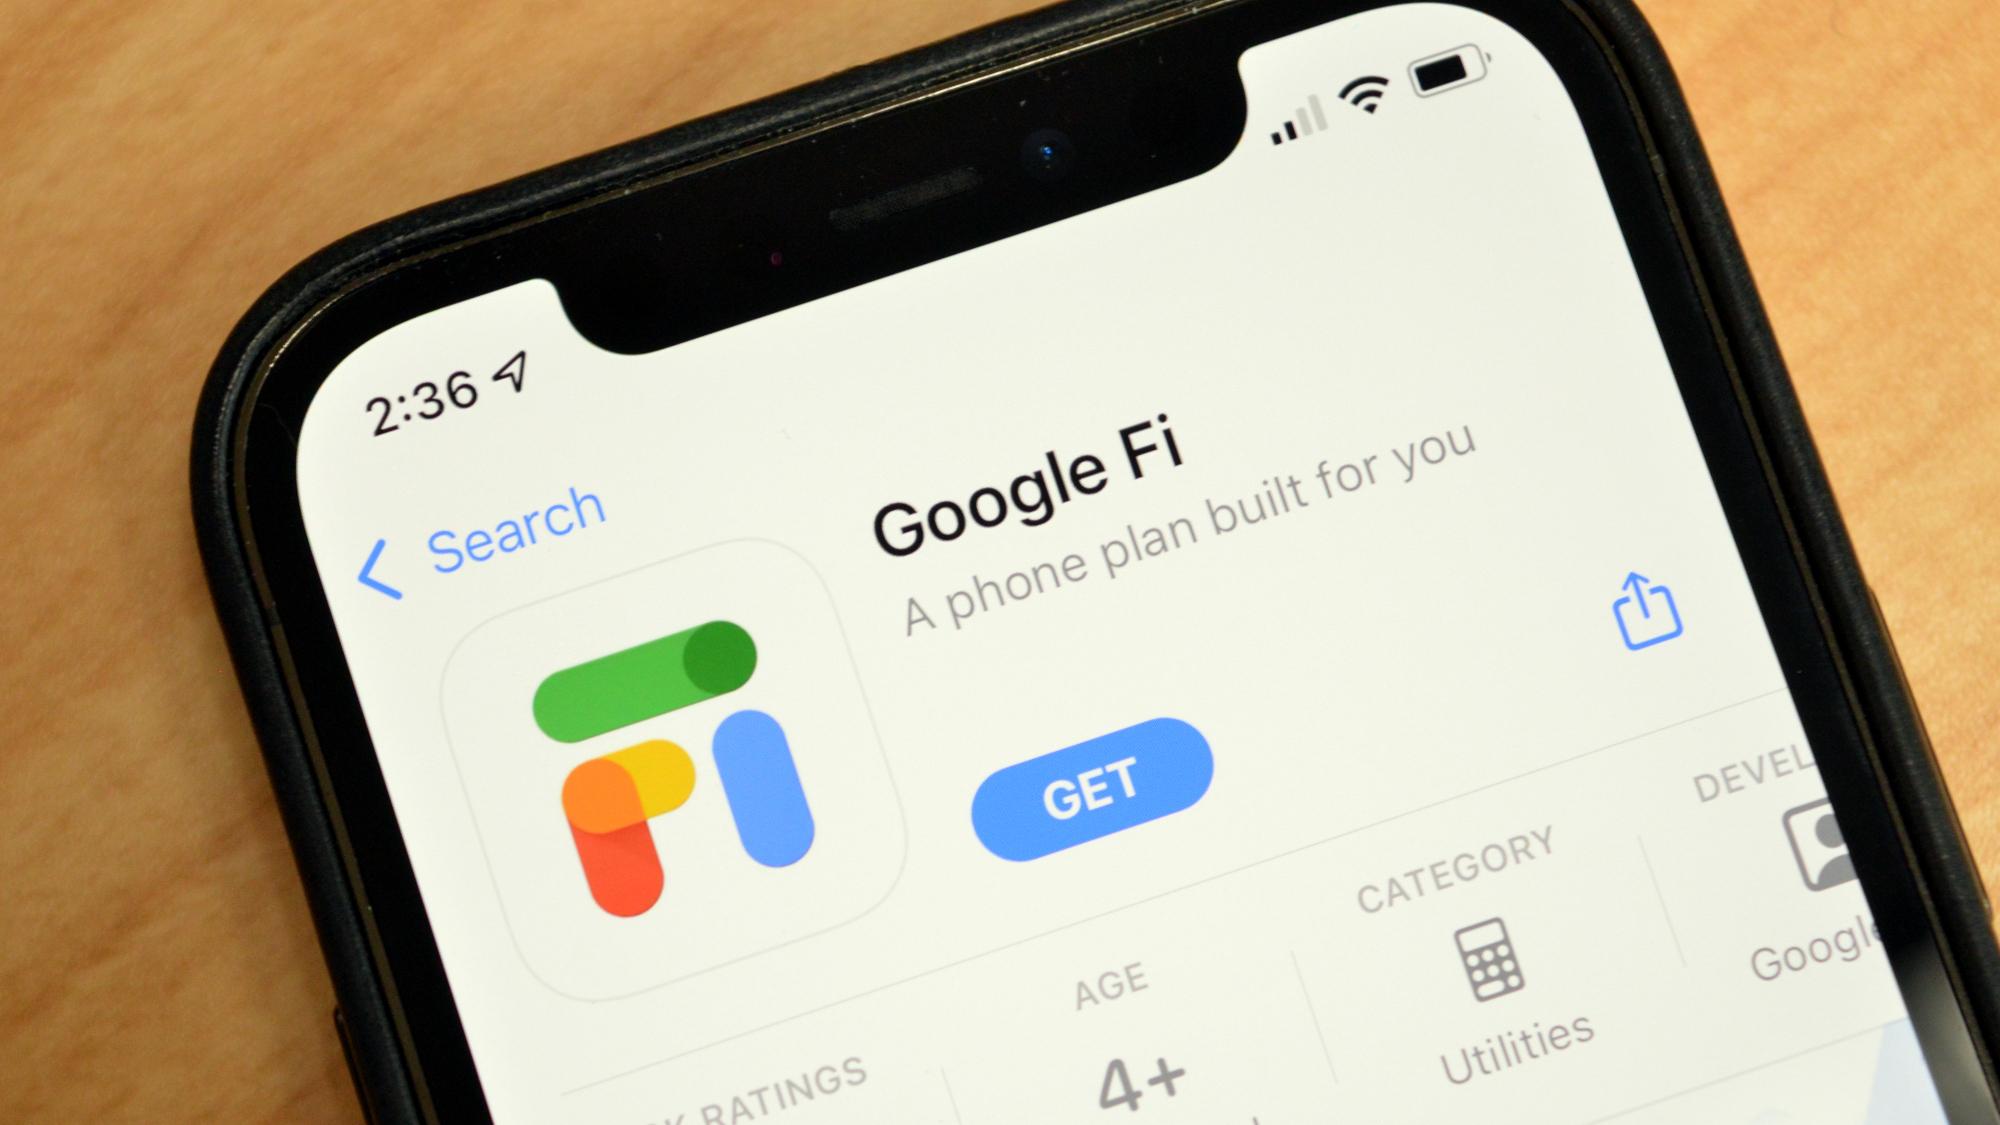 Google Fi App